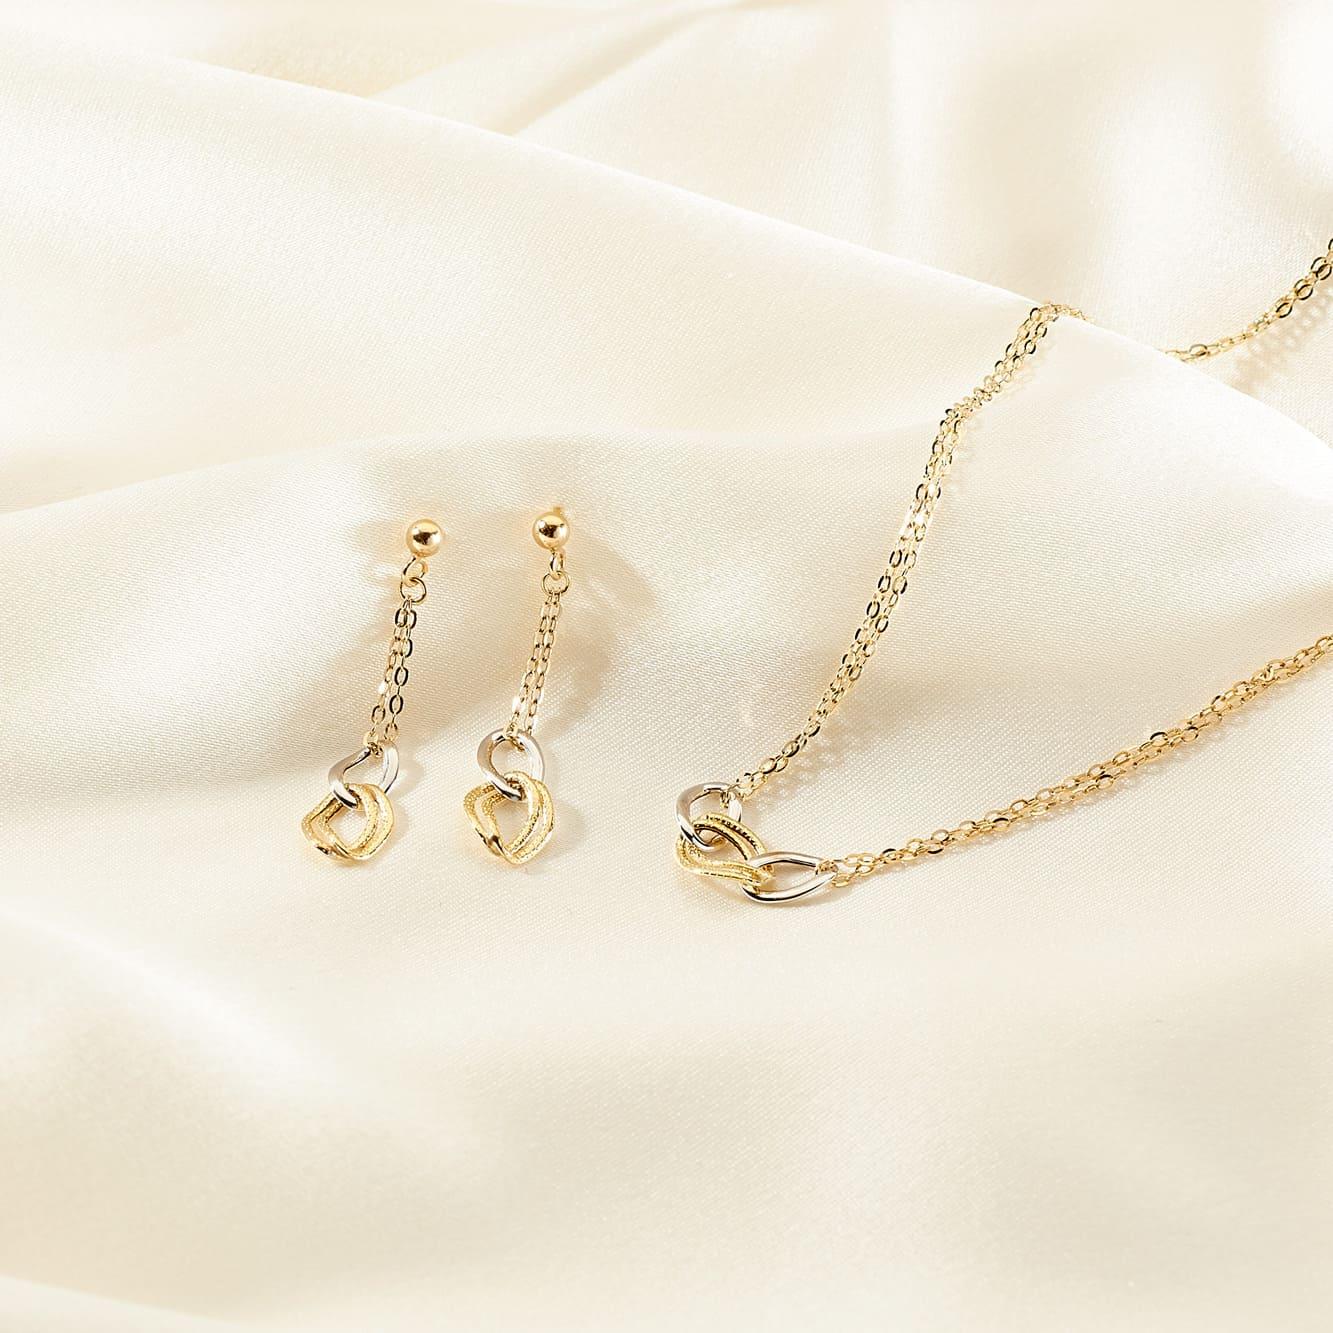 Damen Halskette Gold 375 Bicolor